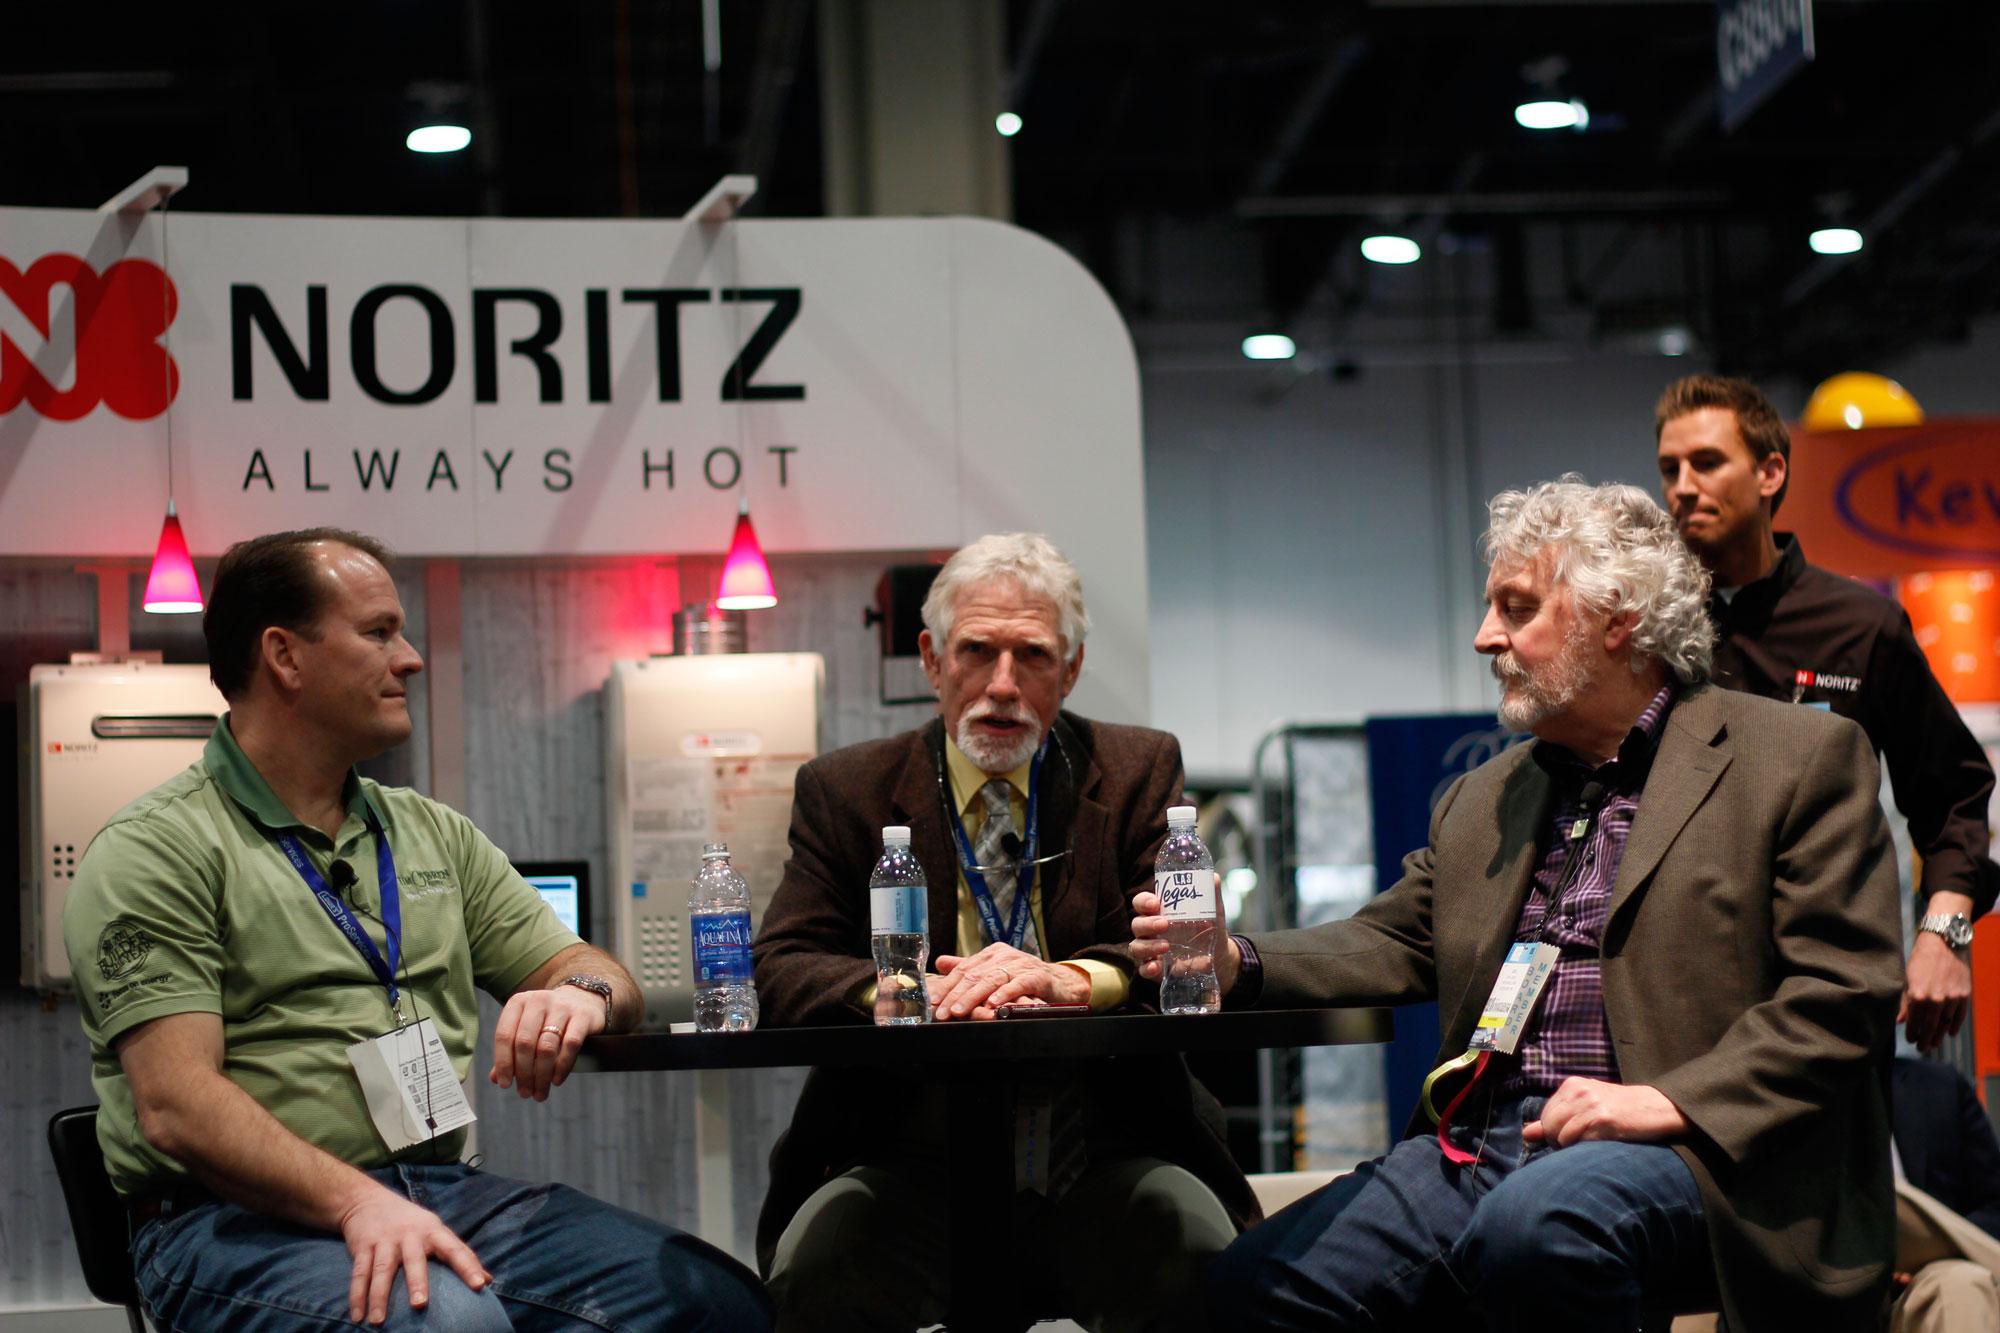 Noritz at Trade Show